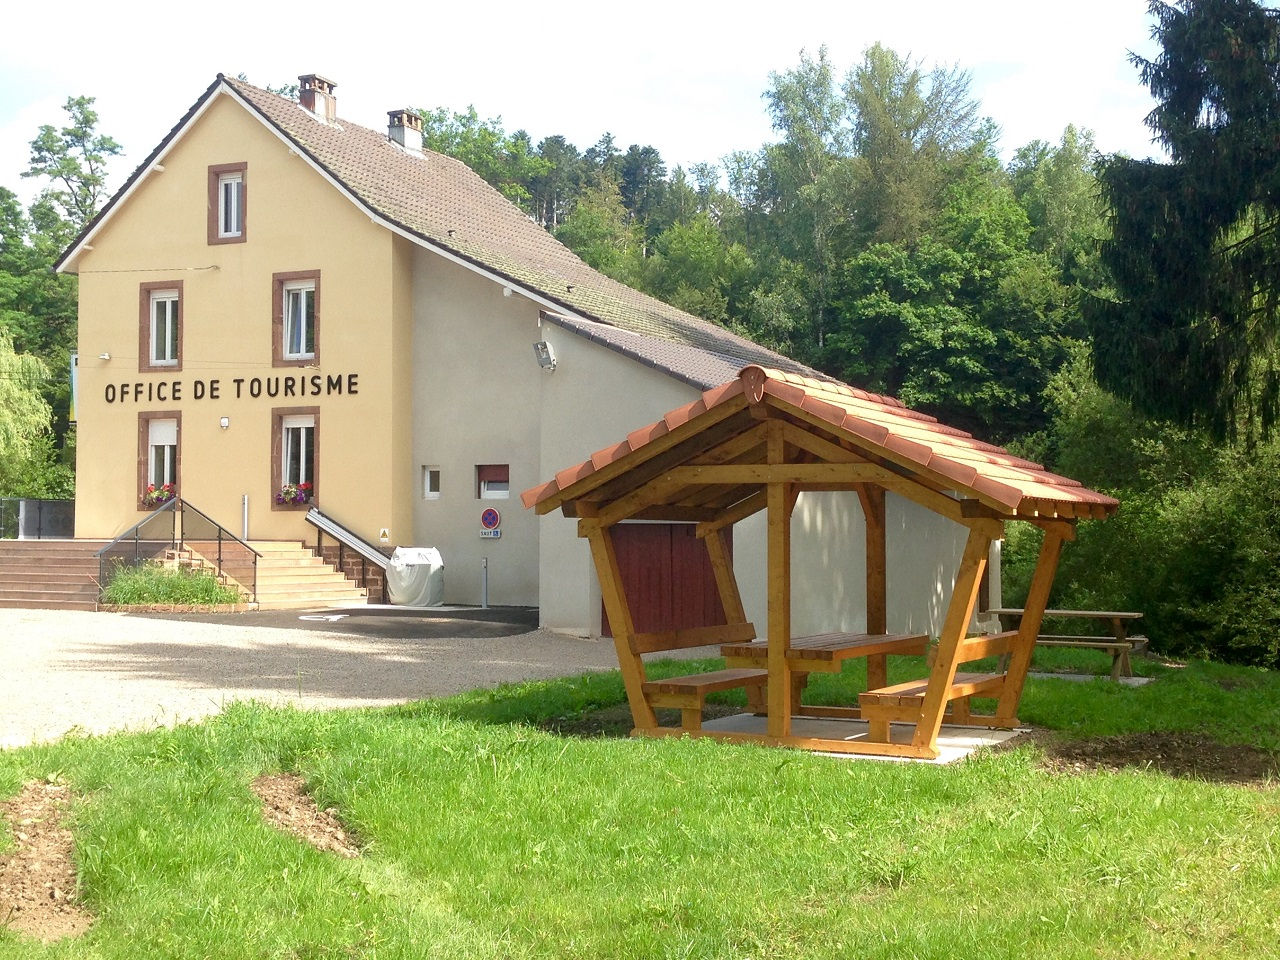 http://www.sitlor.fr/photos/848/848148306_4.jpg